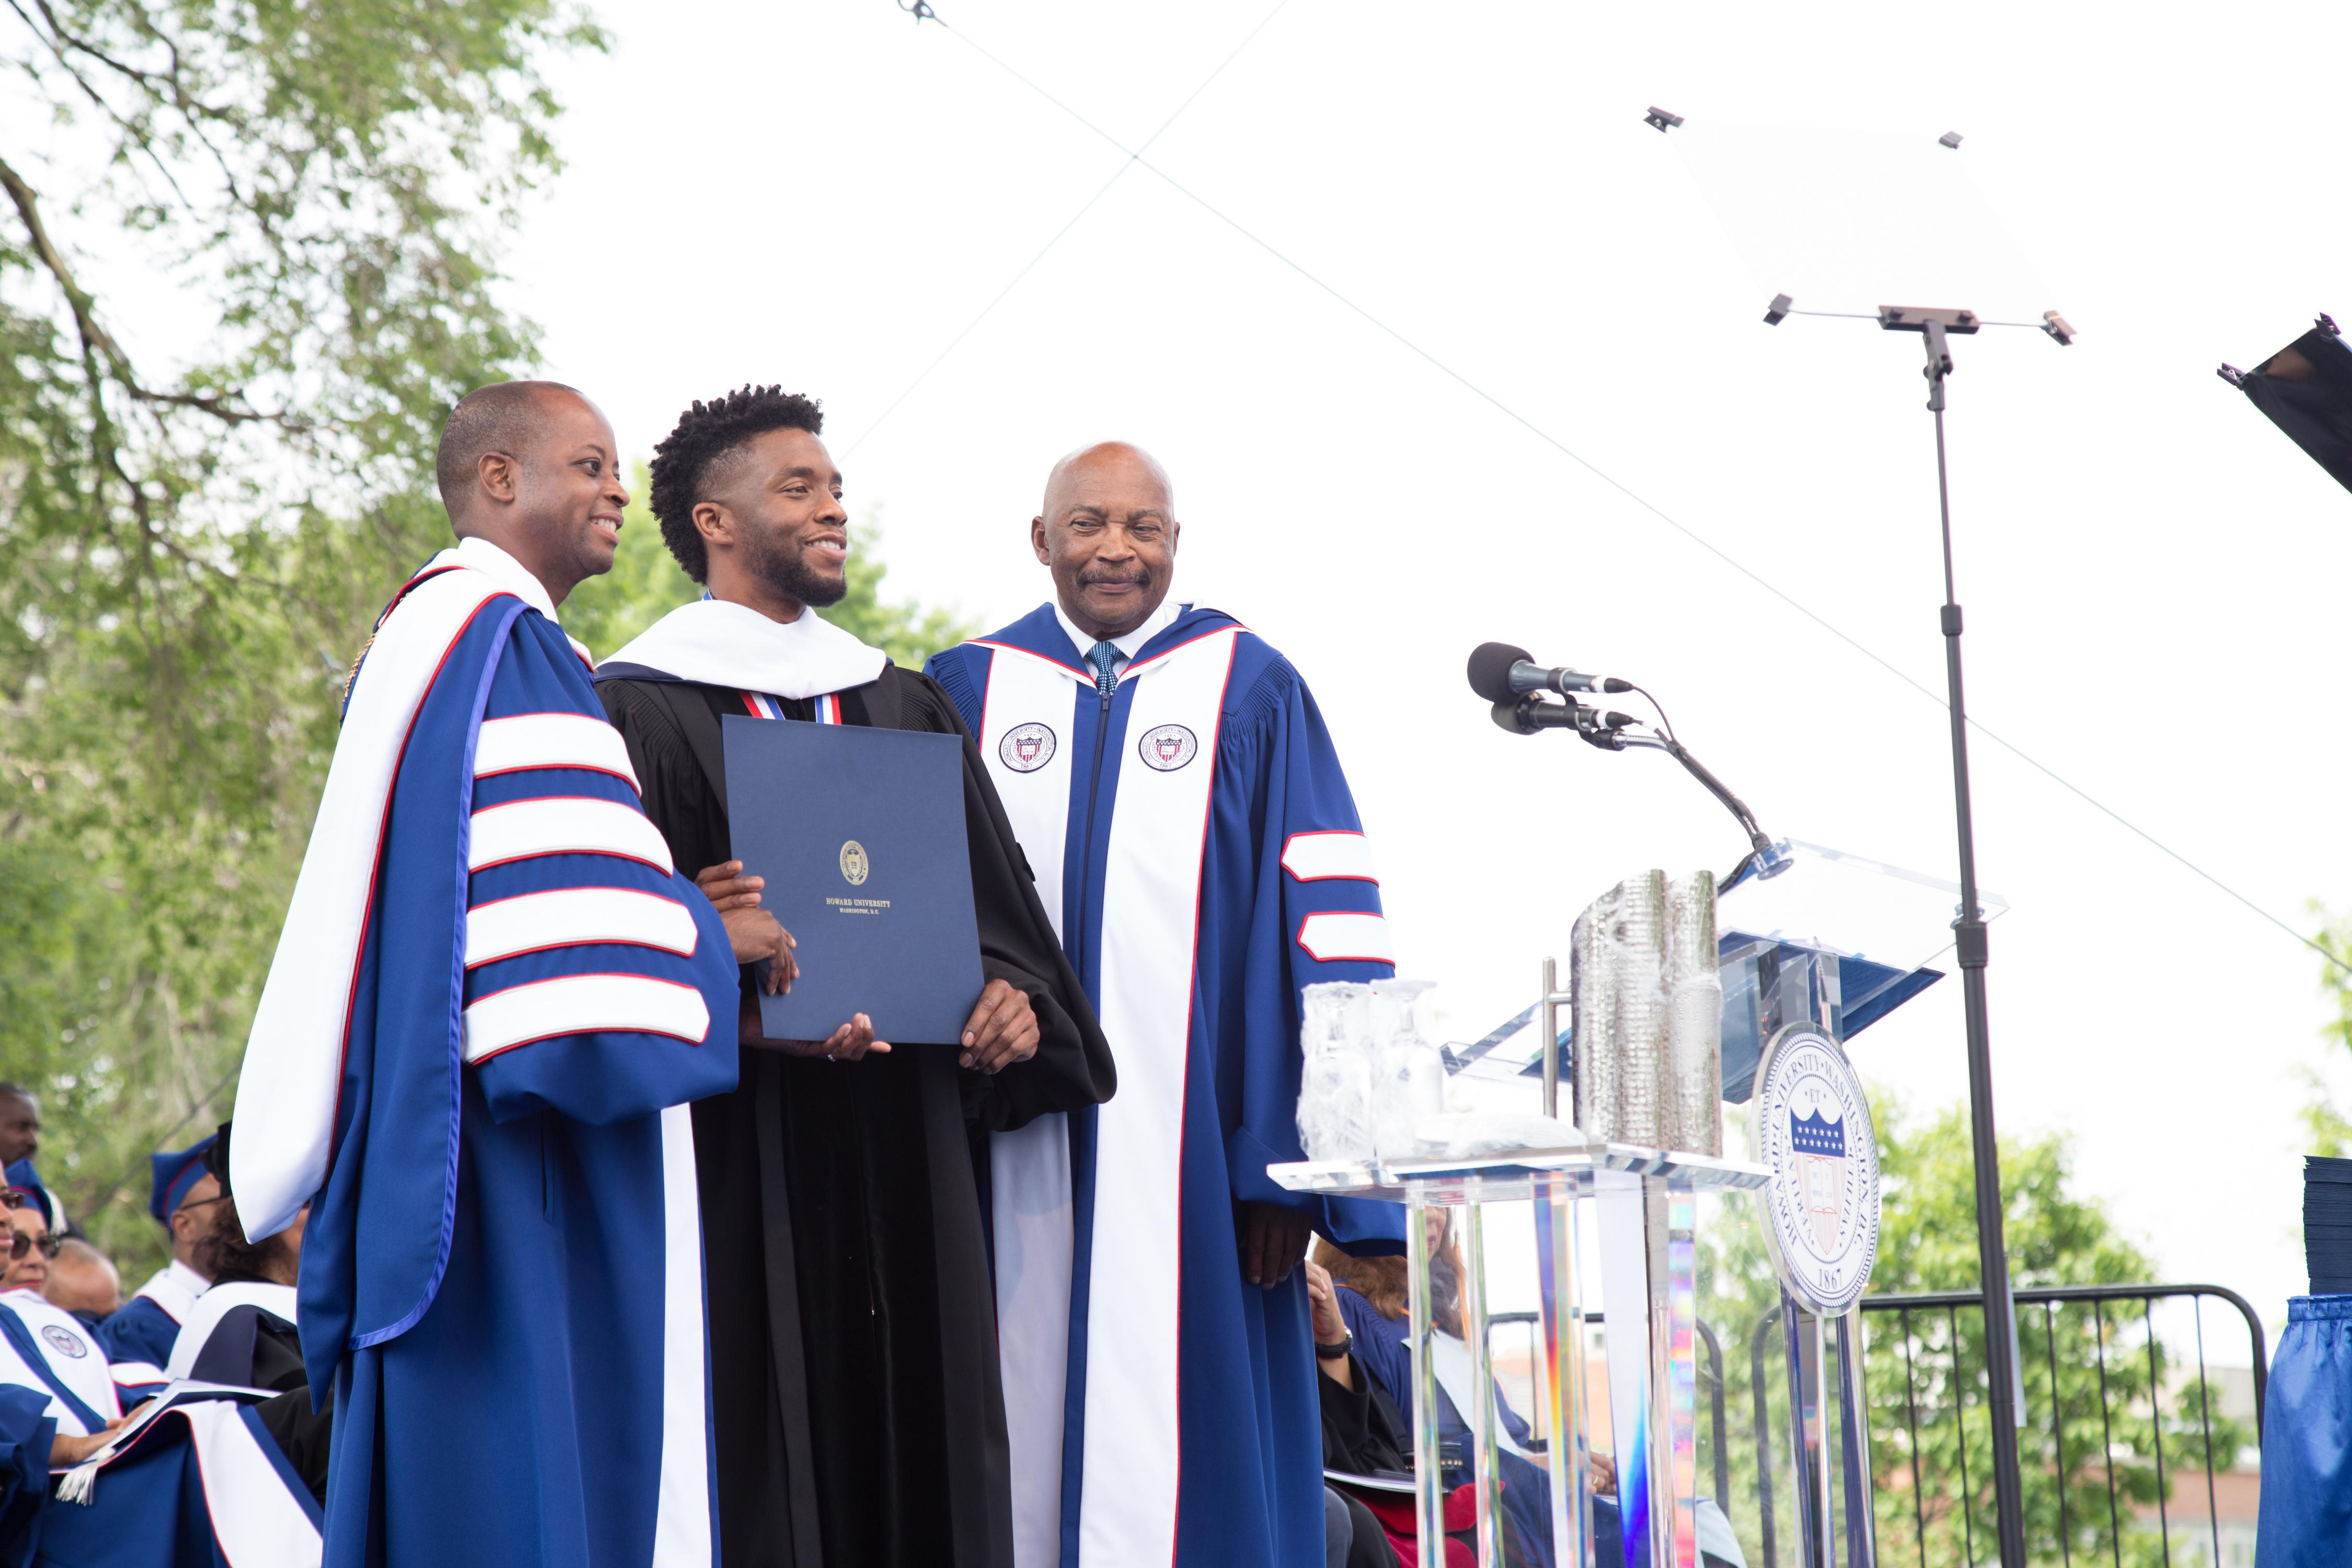 2018 Howard University Commencement Ceremony